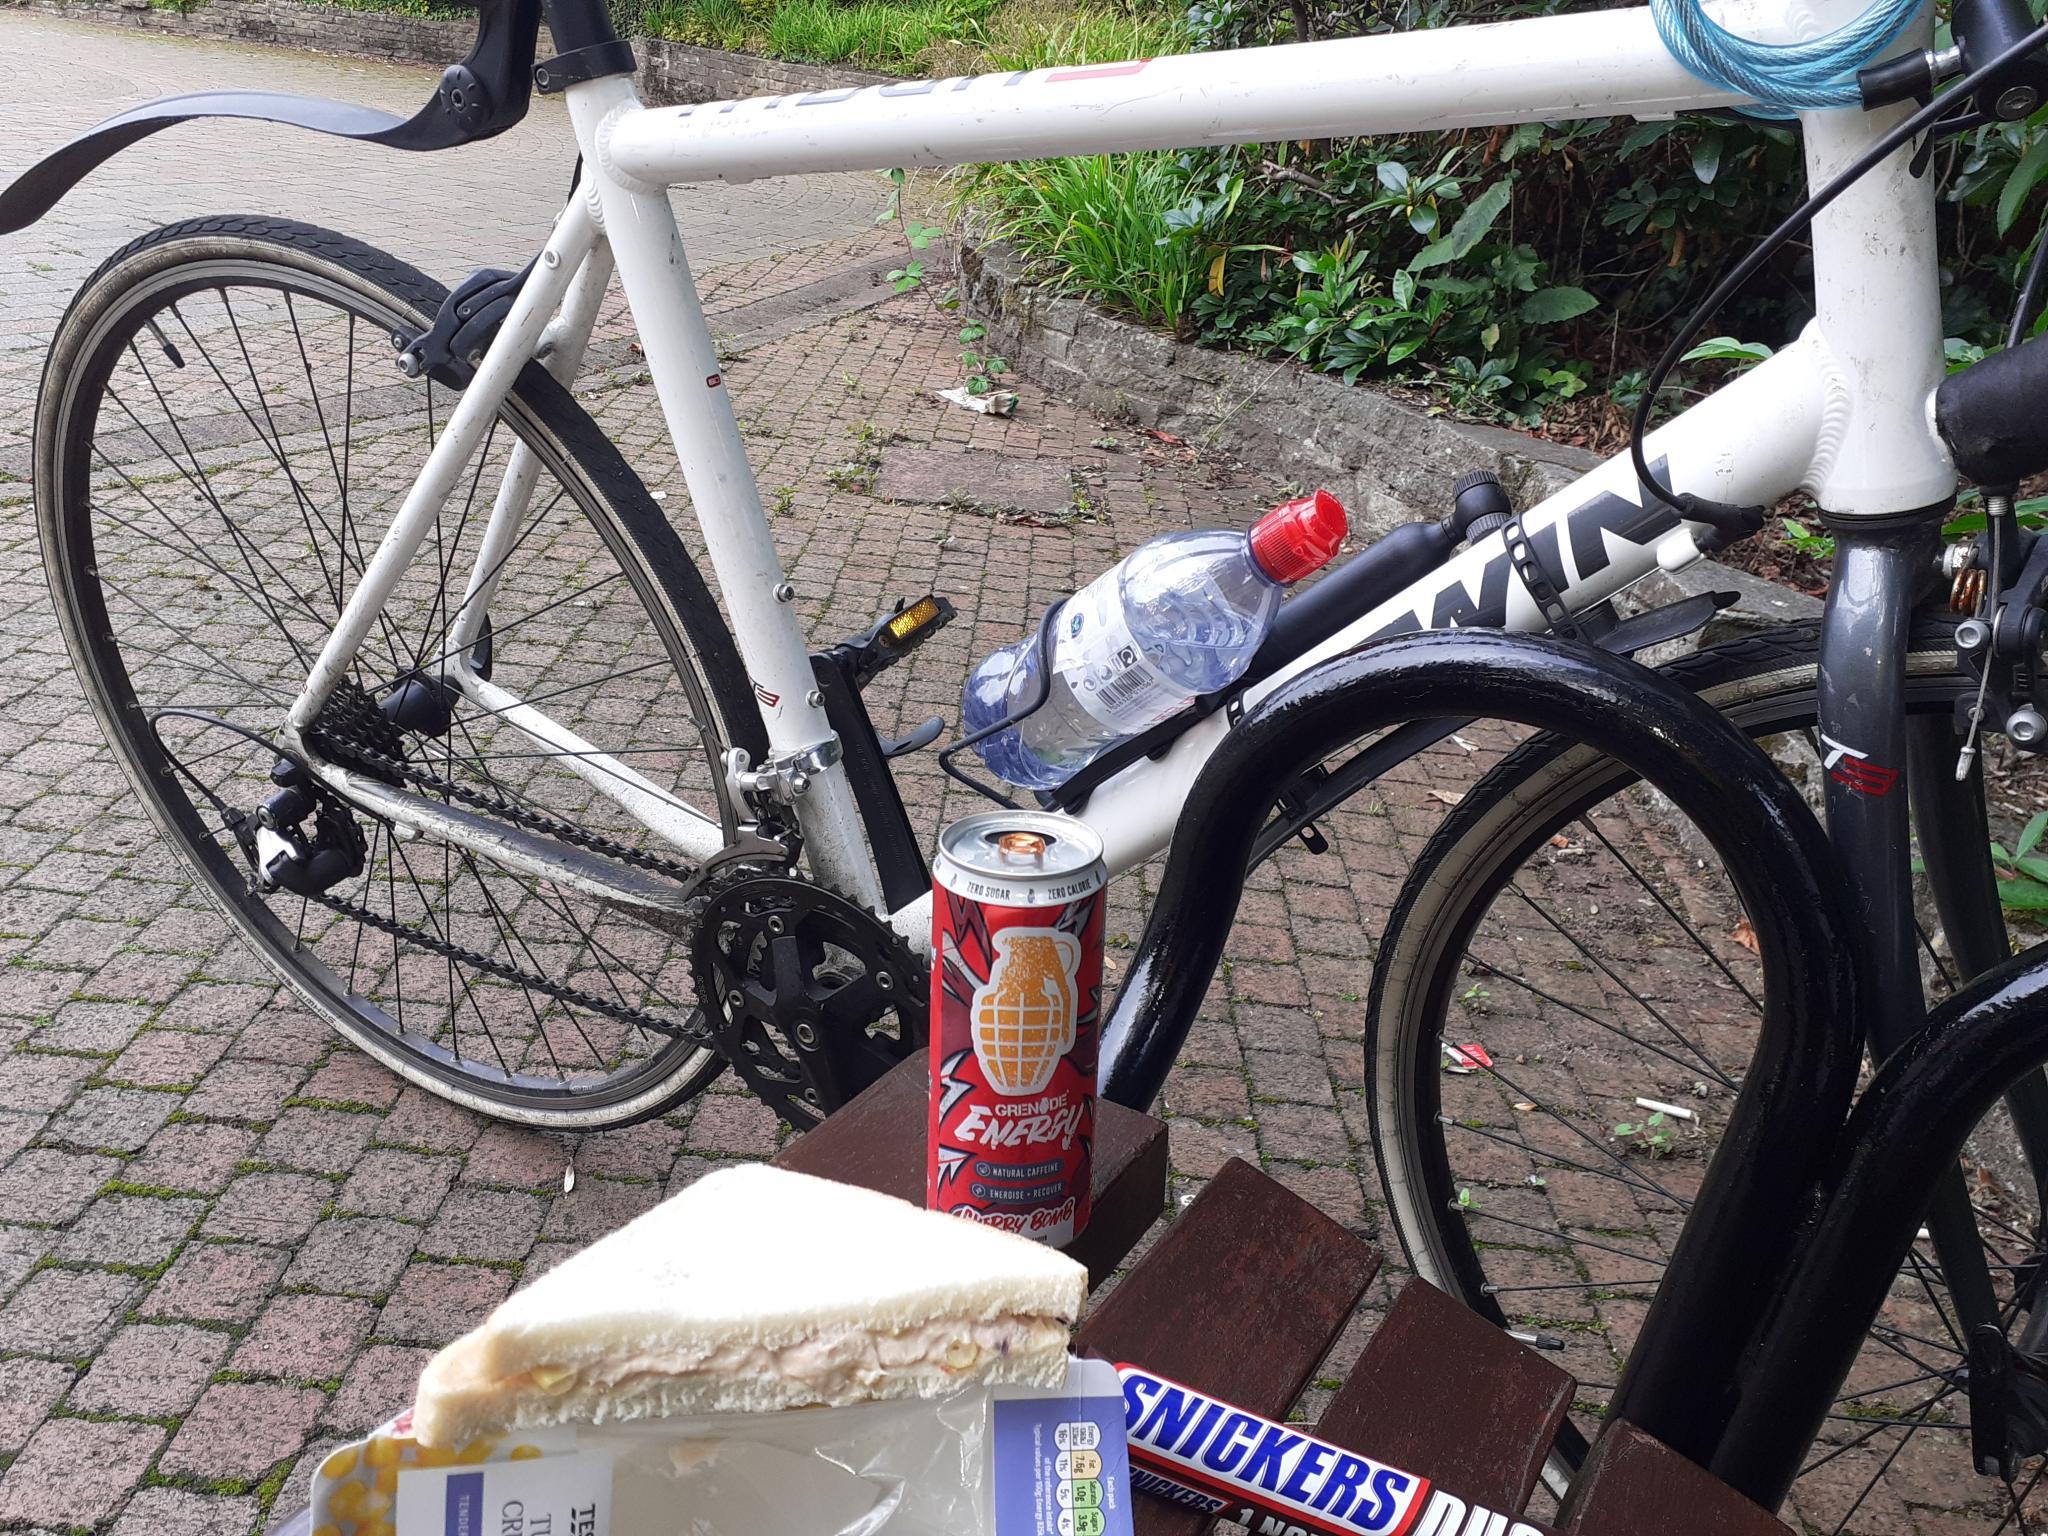 On my bike-20210802_165504-jpg